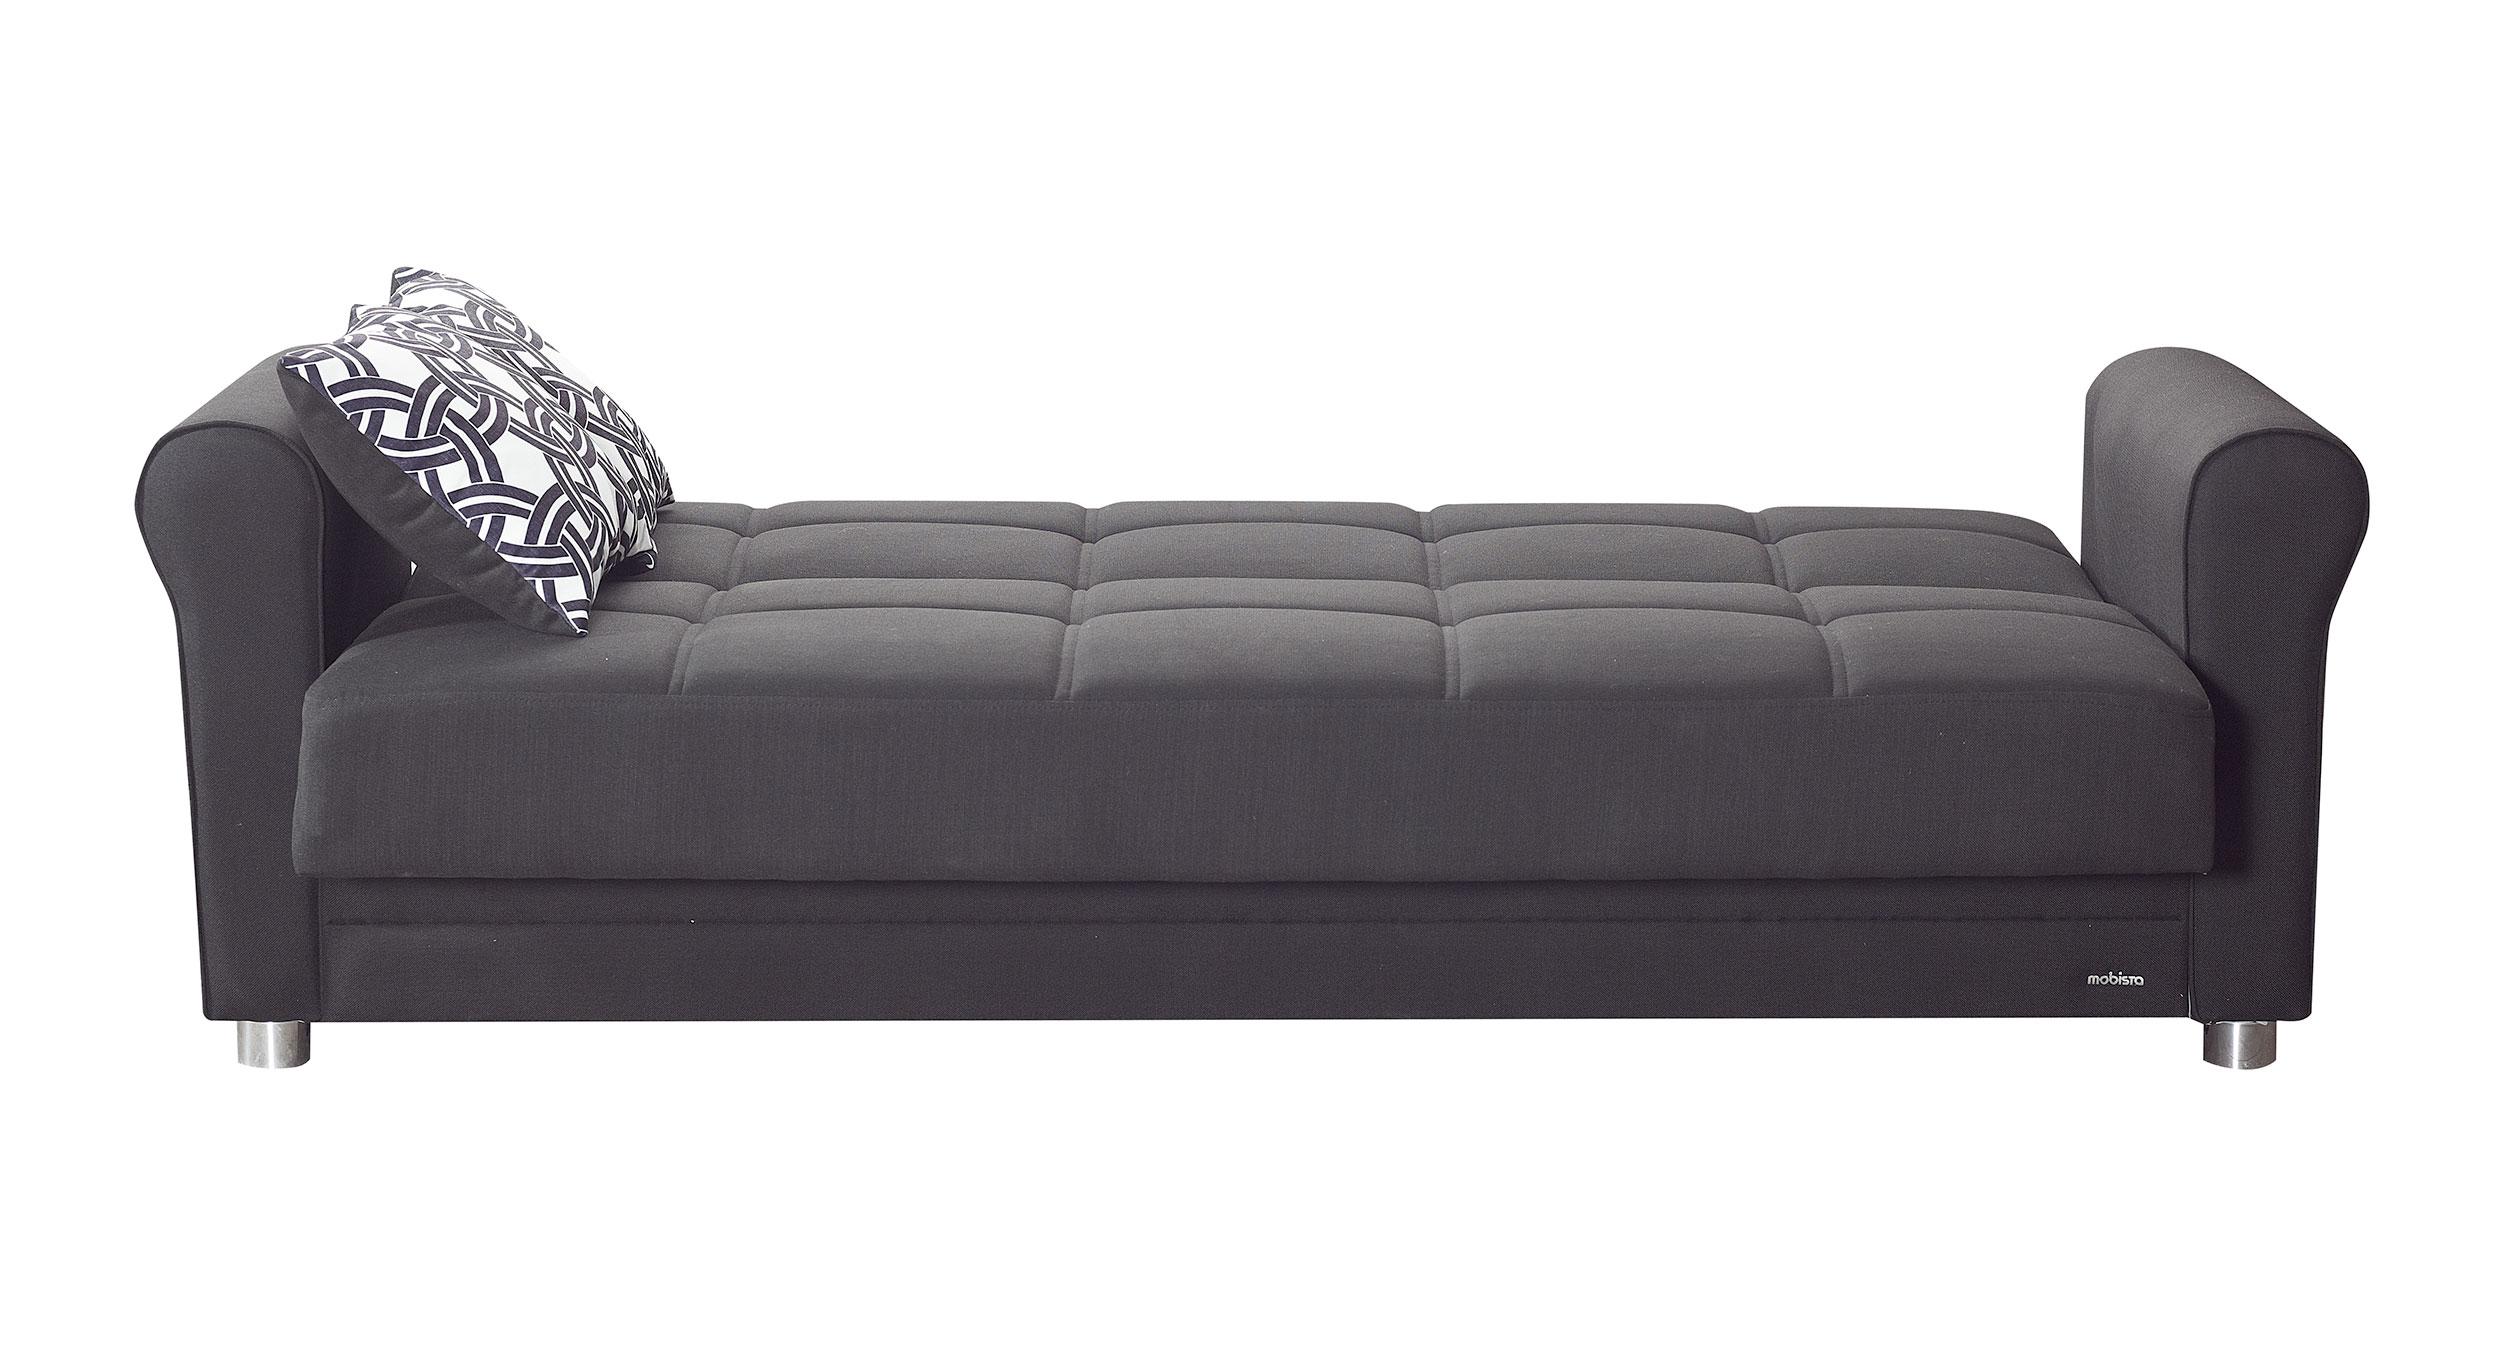 Divano Black Sofa Bed by Mobista